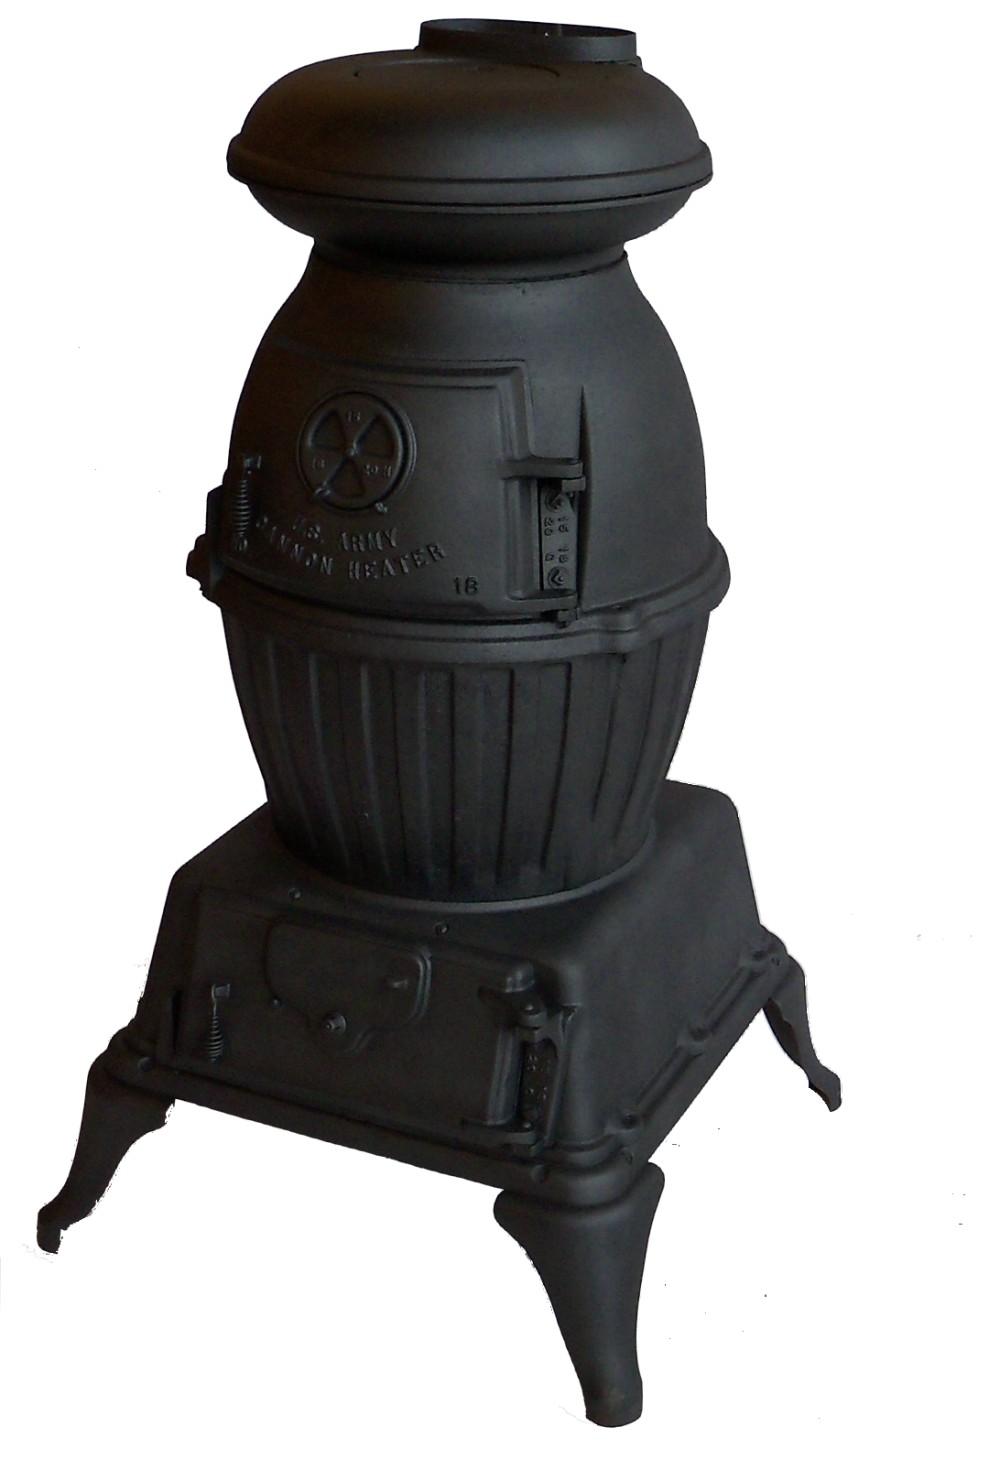 parlor stoves parlor stove antique parlor stoves